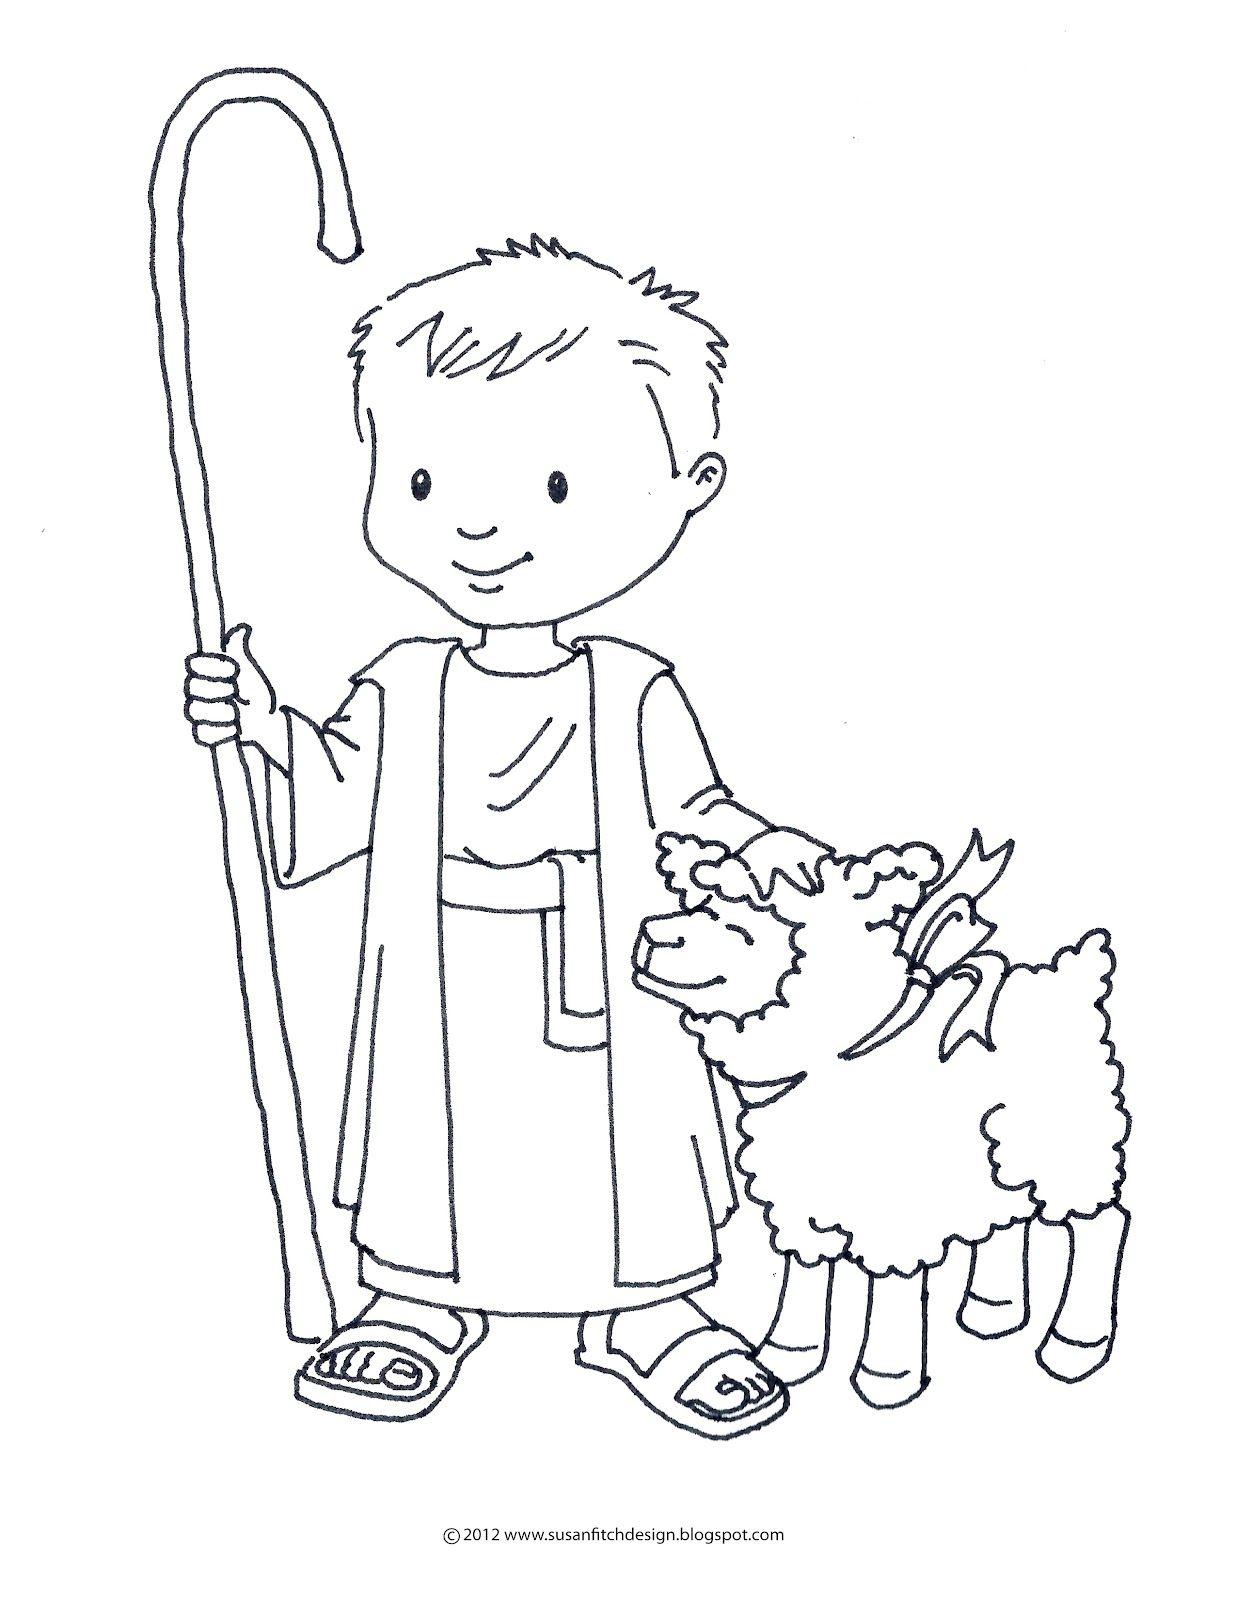 shepard David coloring sheet - Google Search | coloring sheets ...